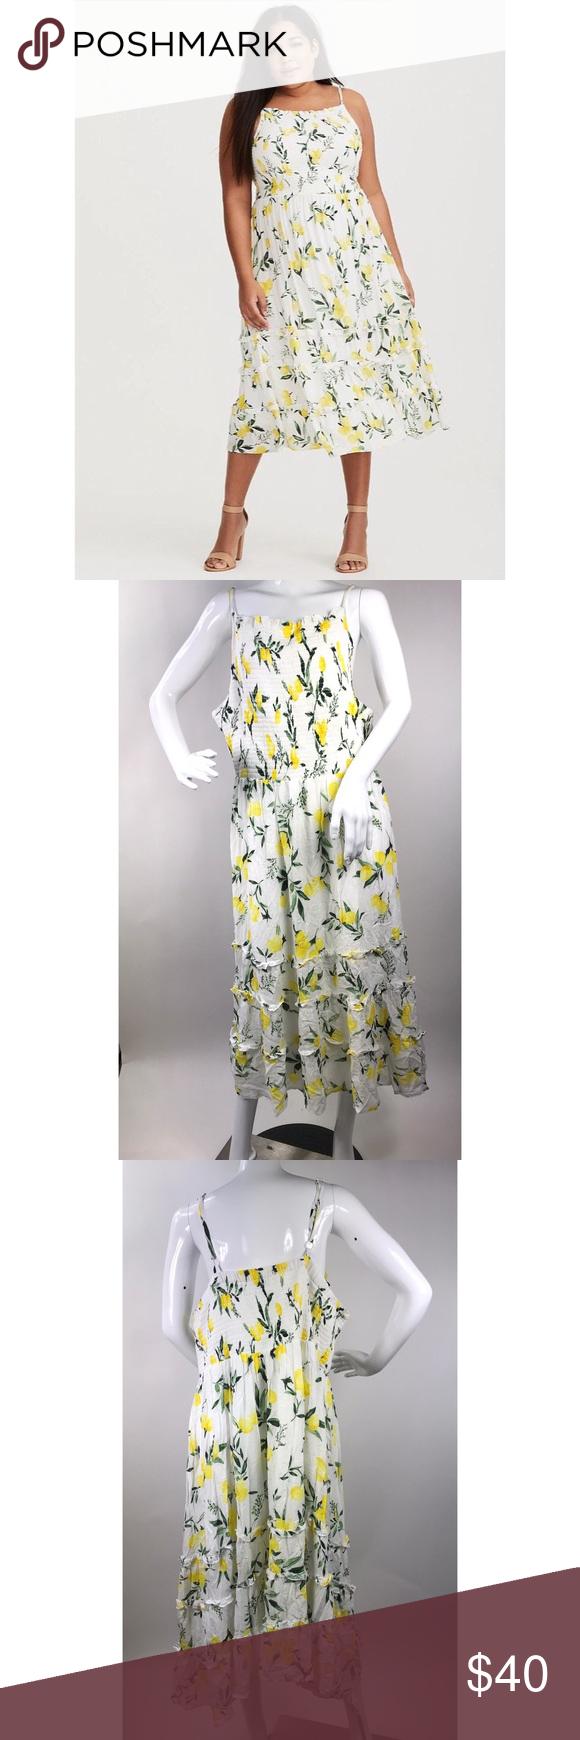 27aa96807fe7 Torrid Size 3X Sleeveless Lemon Print Dress Torrid Size 3X Spaghetti Strap Dress  White Lemon Print